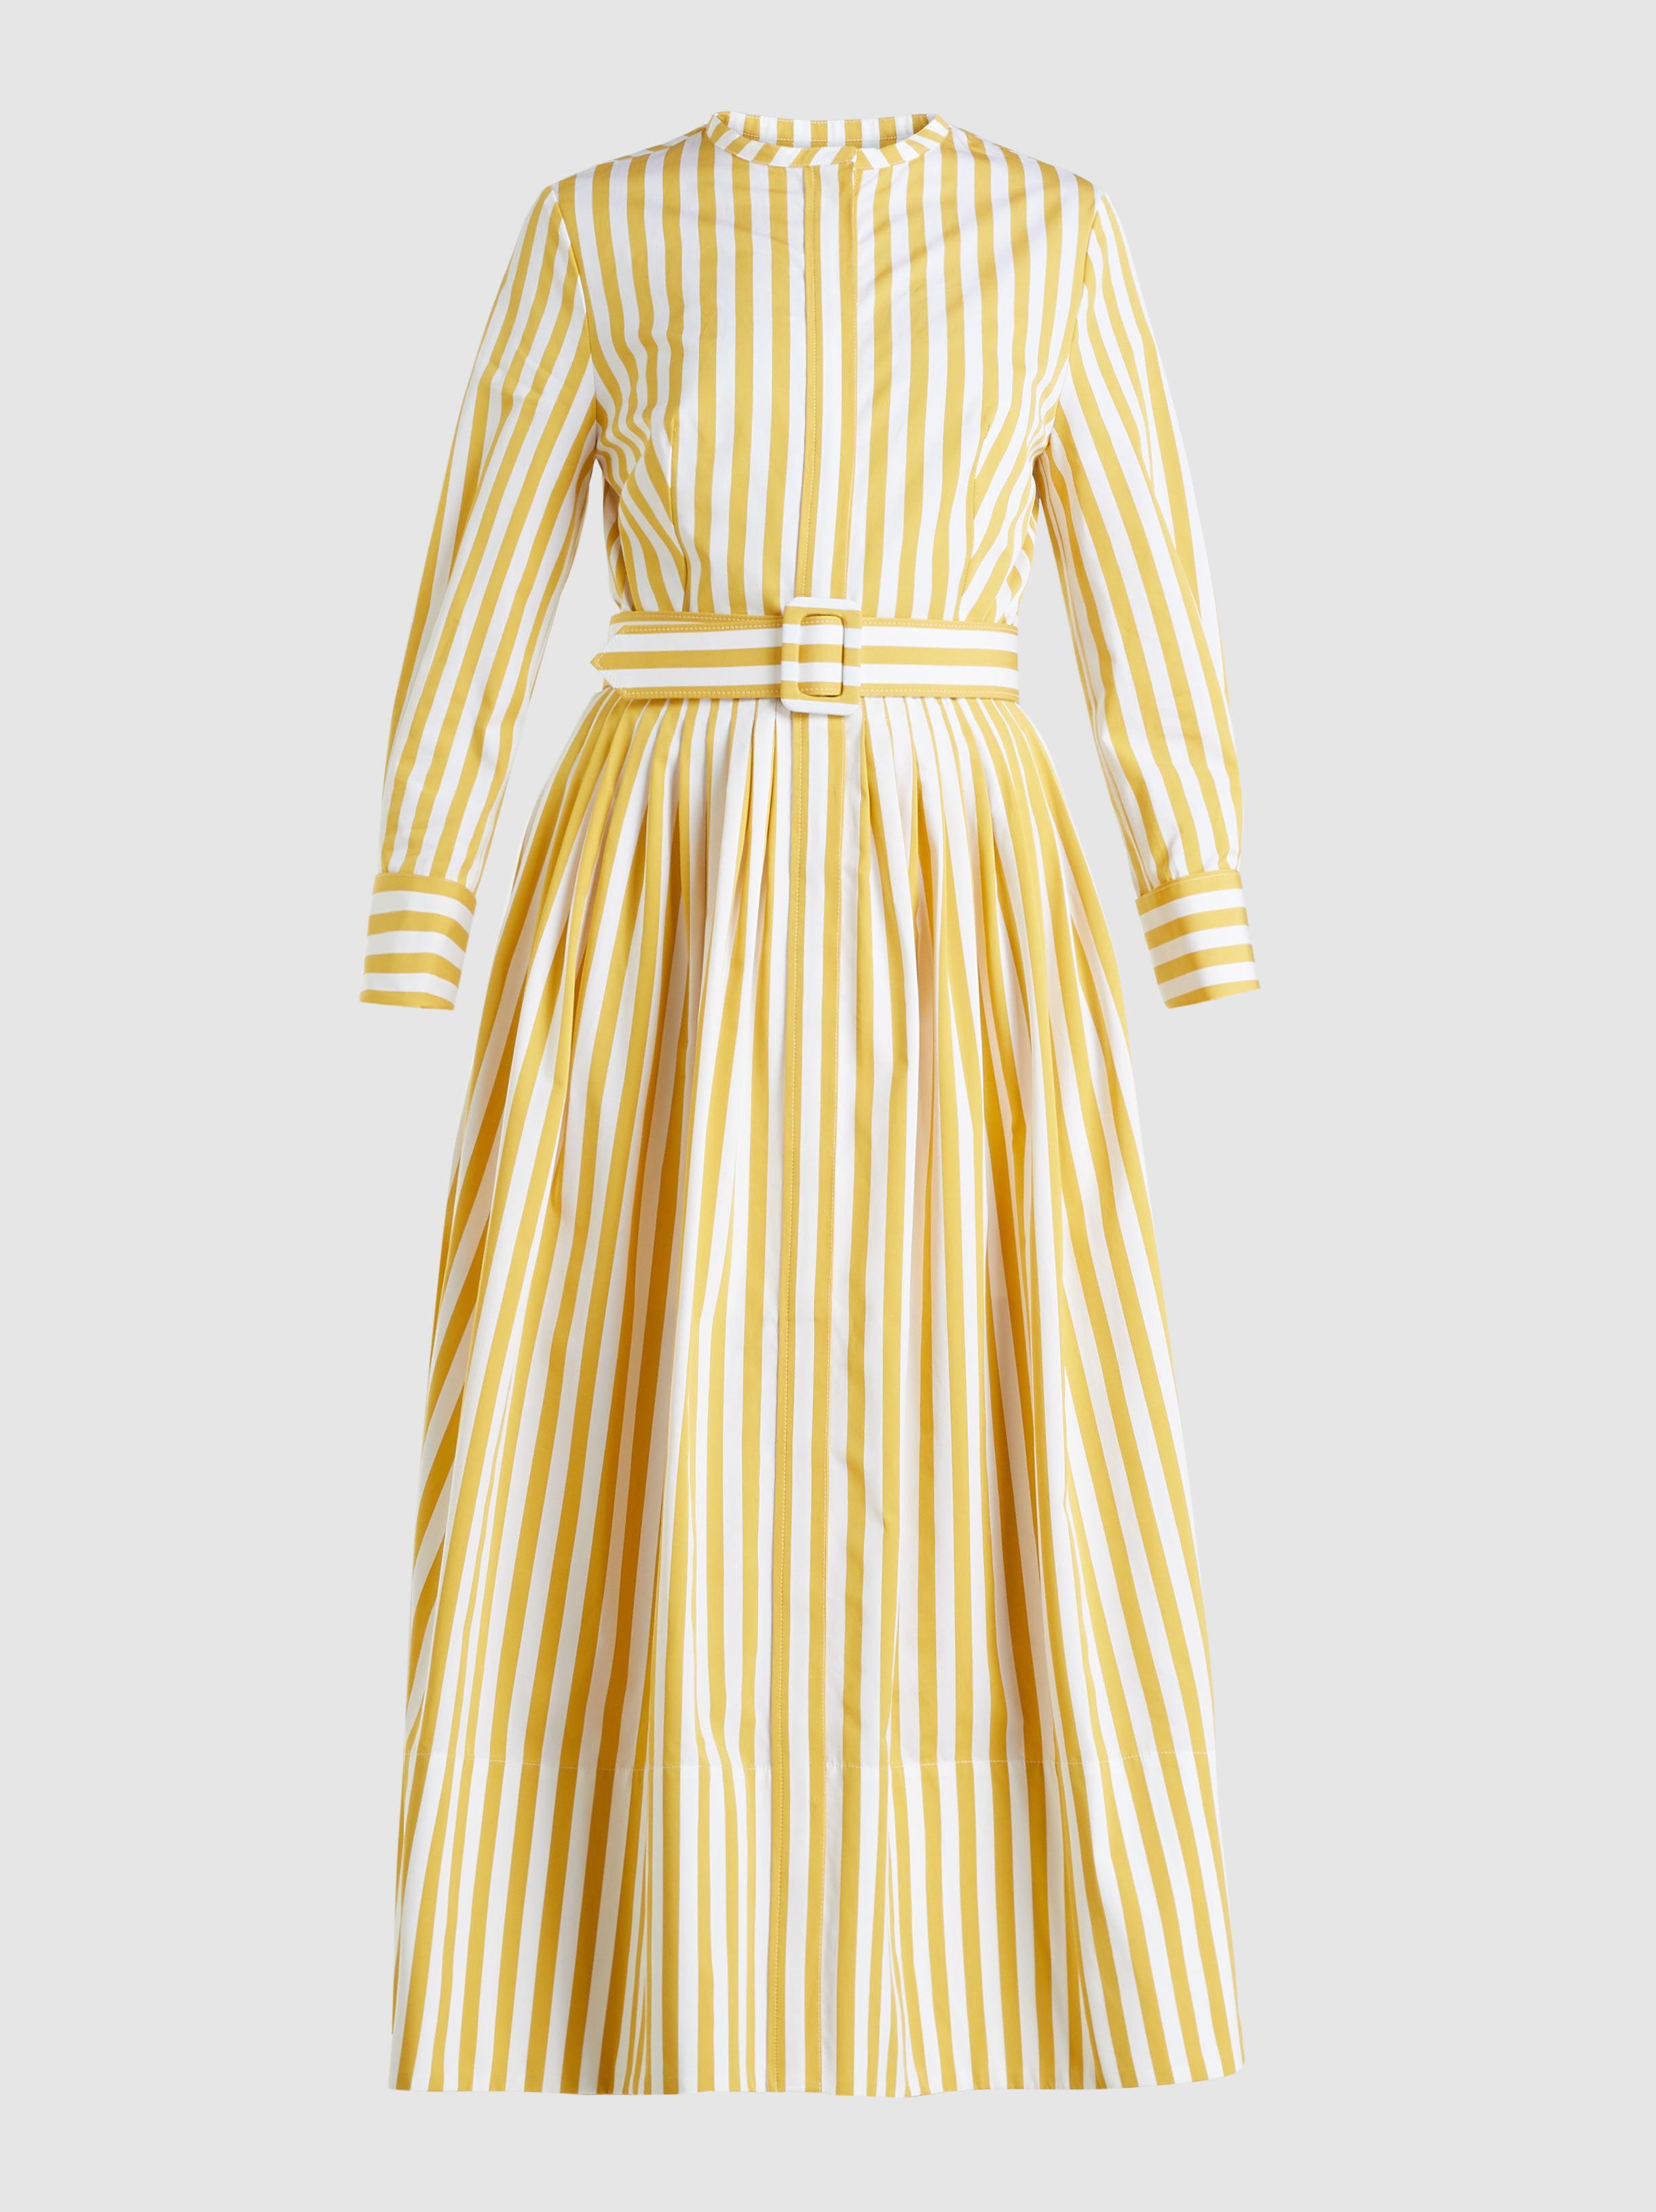 Lyst - Oscar de la Renta Striped Cotton Midi Dress in Yellow 56538c143